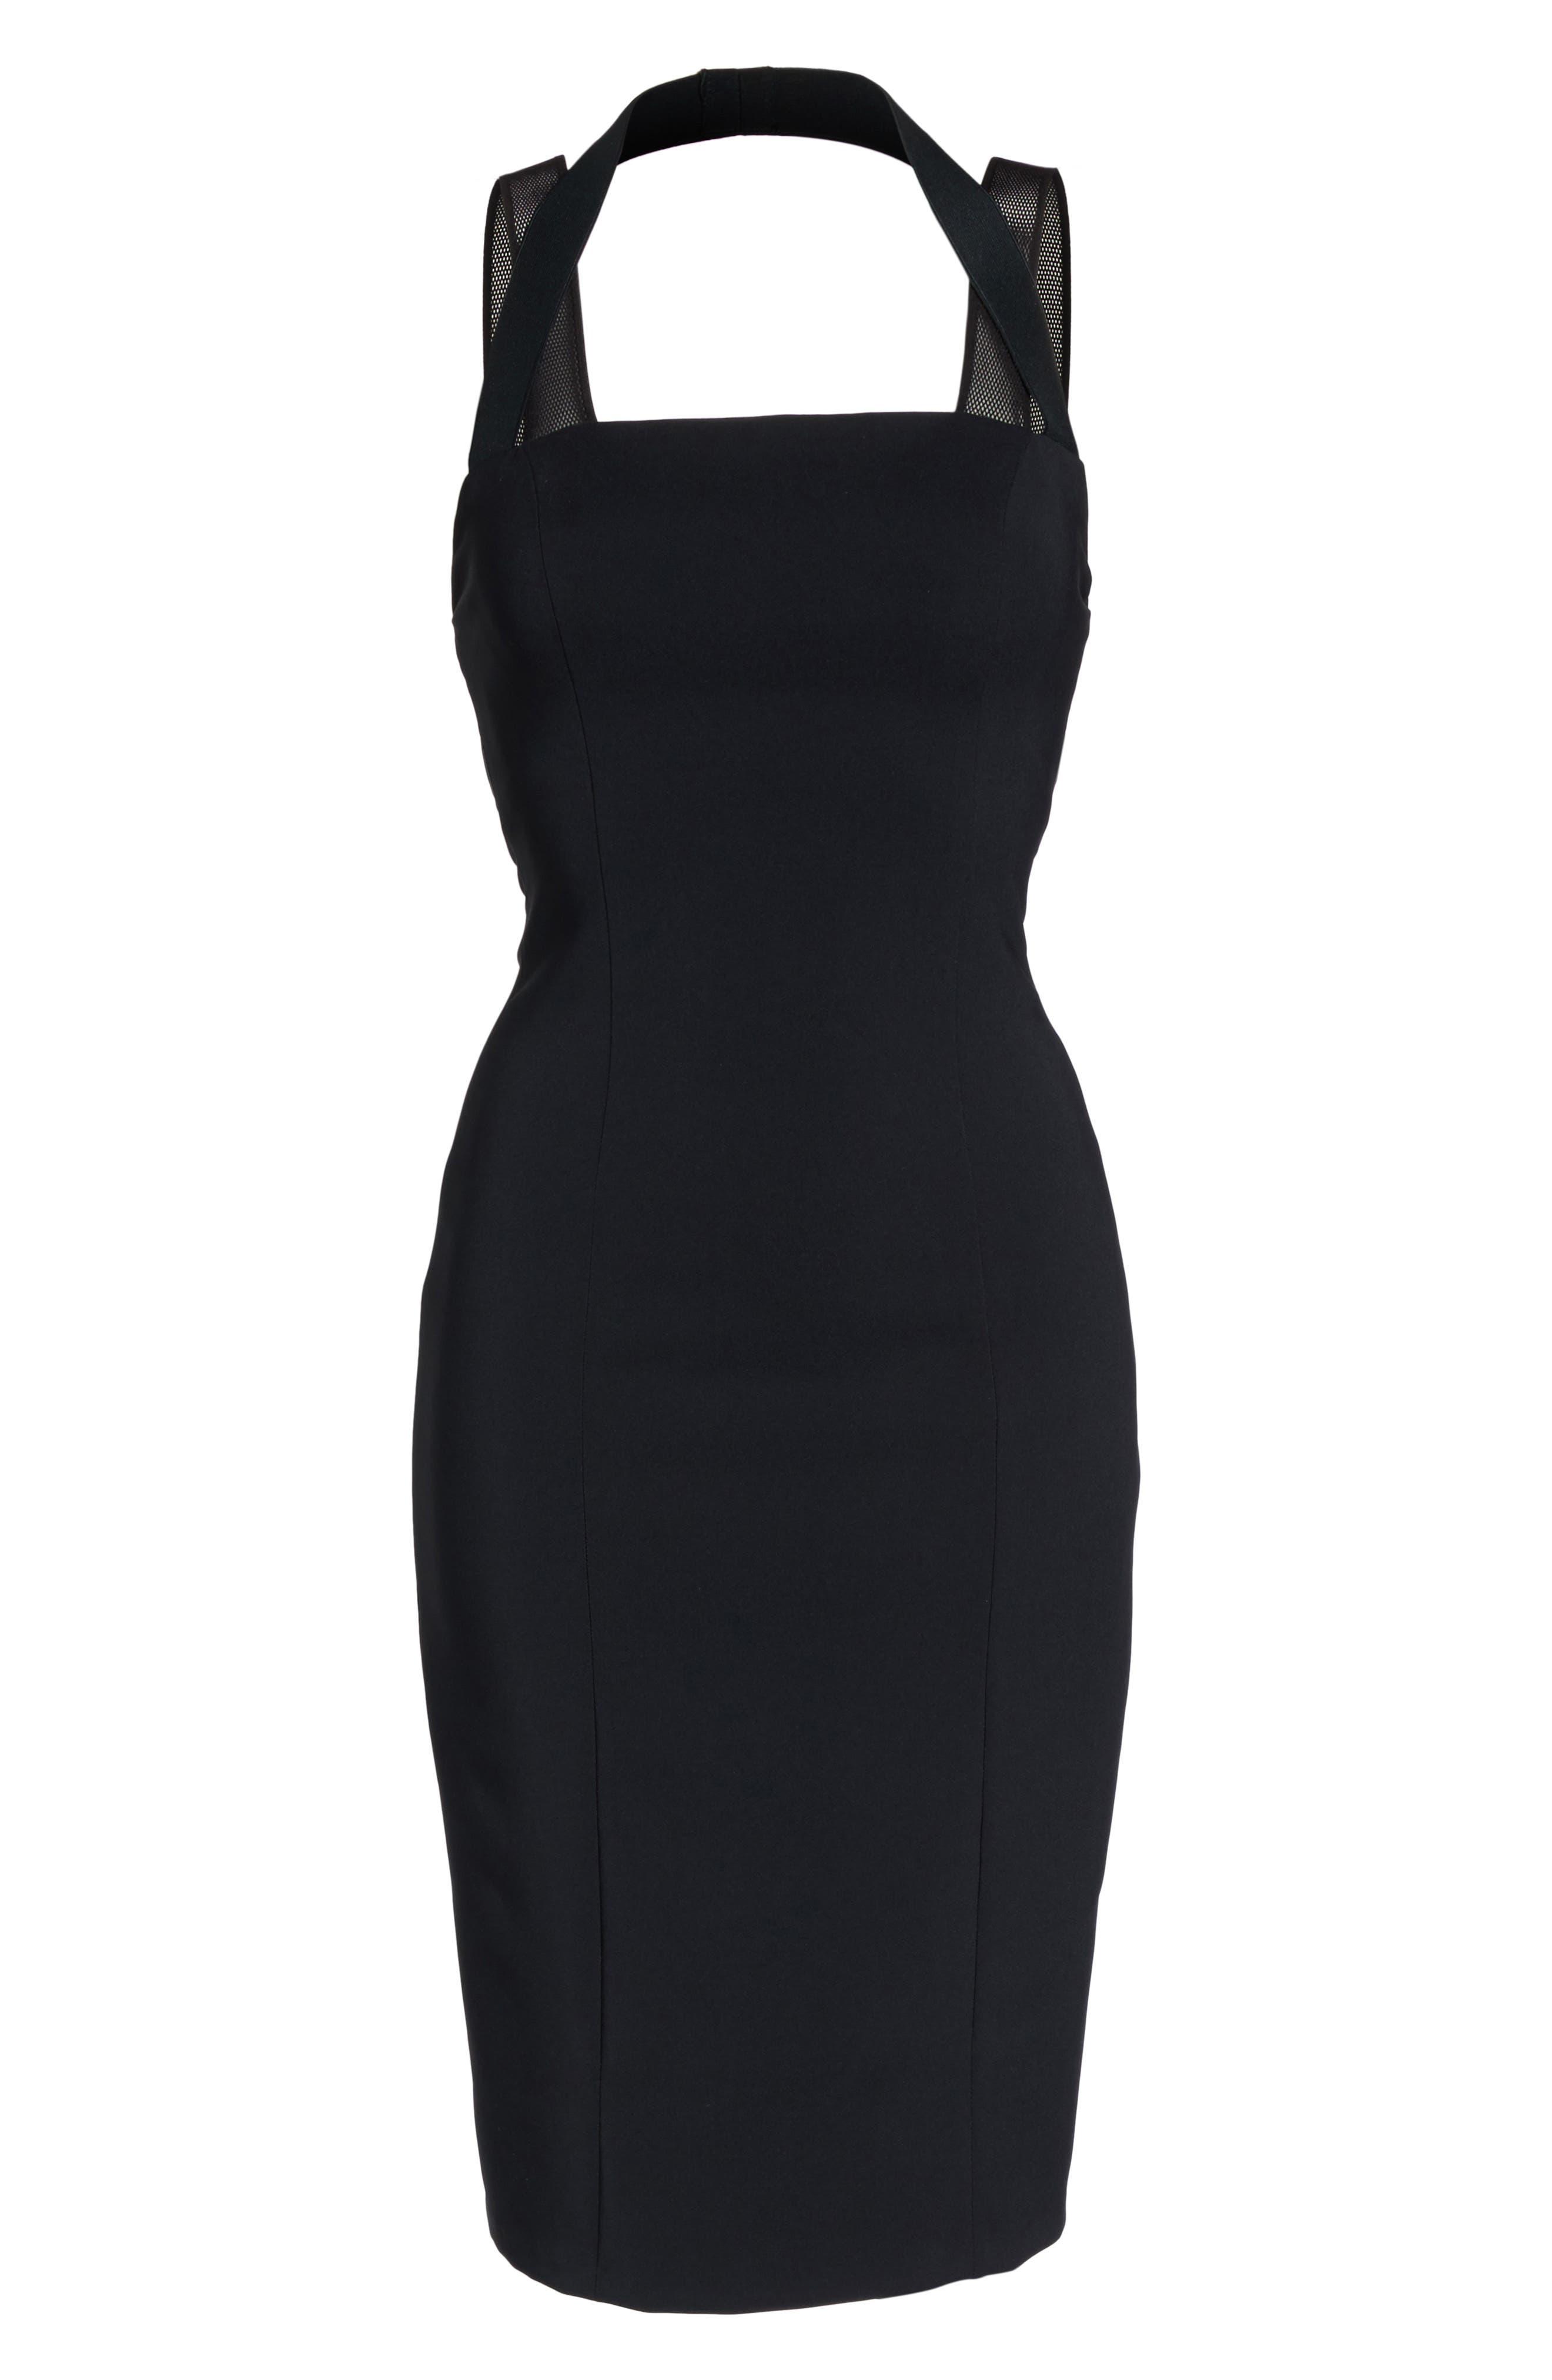 Kendra Elastic Strap Low Back Sheath Dress,                             Alternate thumbnail 6, color,